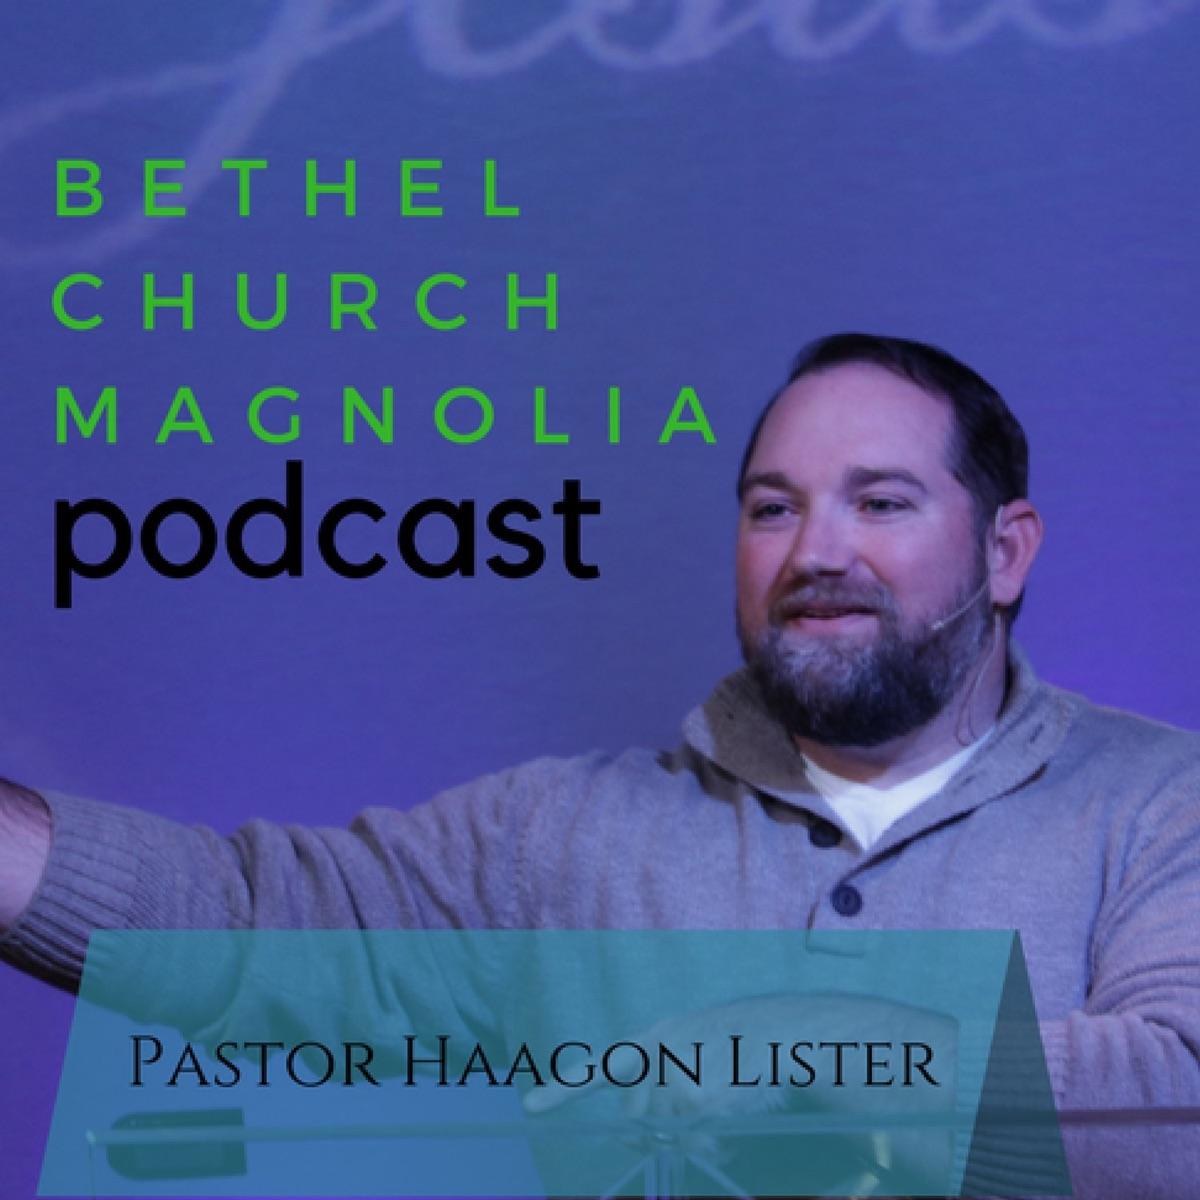 Bethel Church Magnolia Podcast